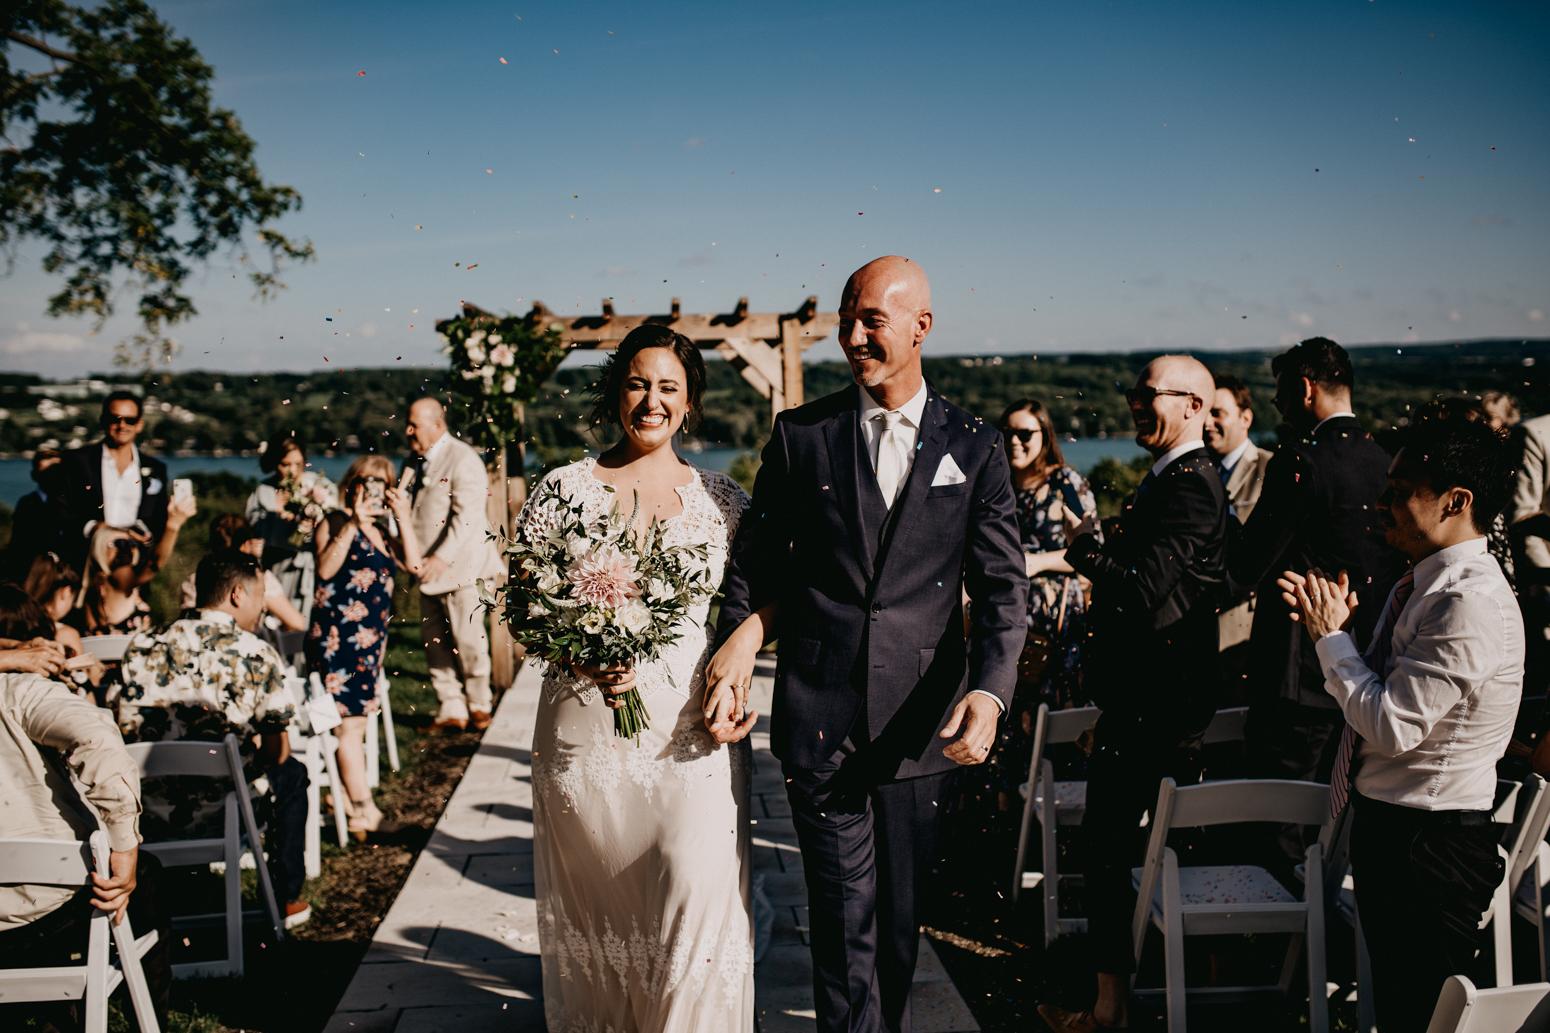 Rochester, NY Wedding Photographer (101 of 133).jpg